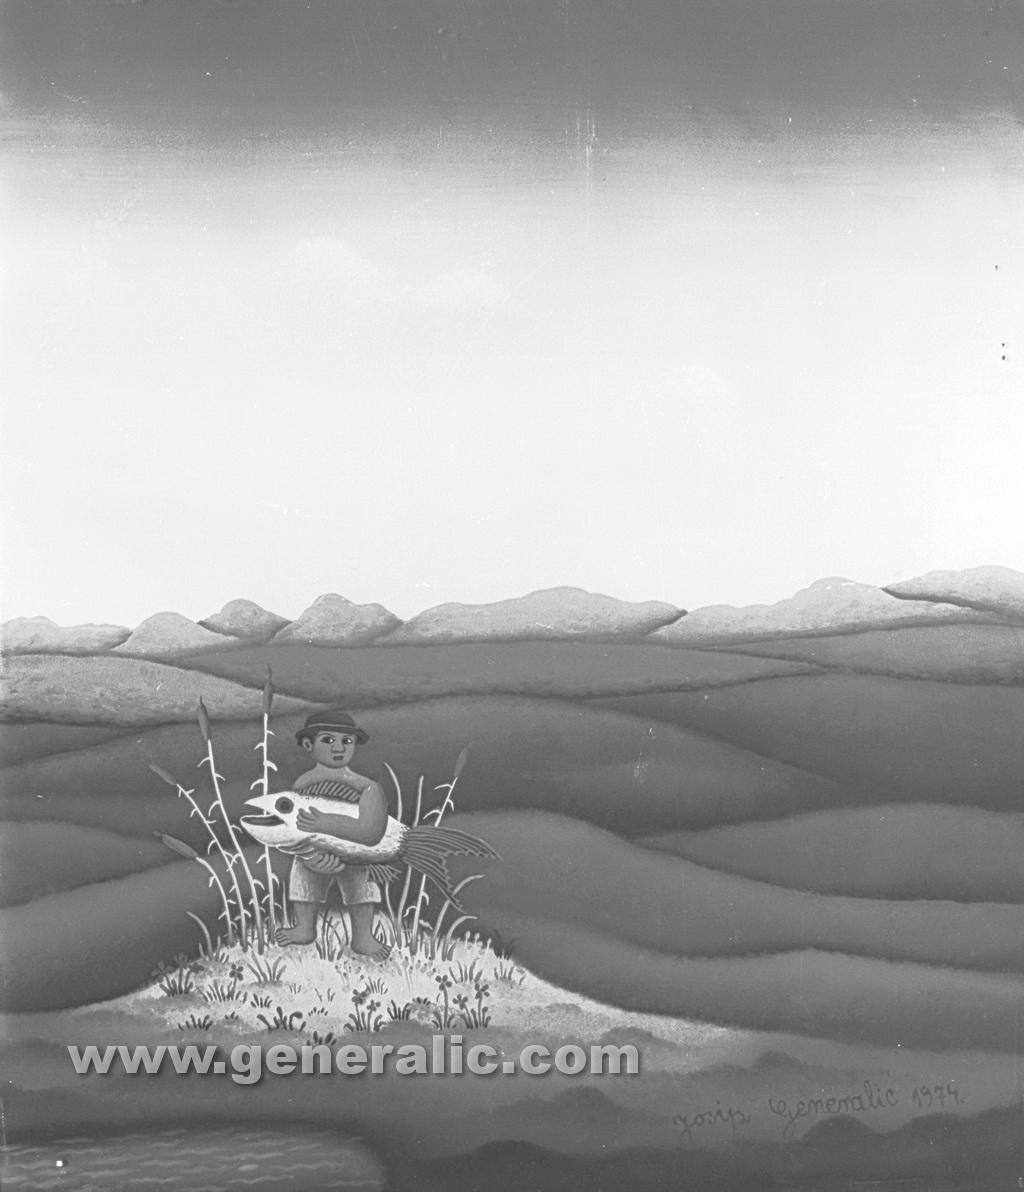 Josip Generalic, 1974, Fisherman, oil on canvas, 42x35 cm